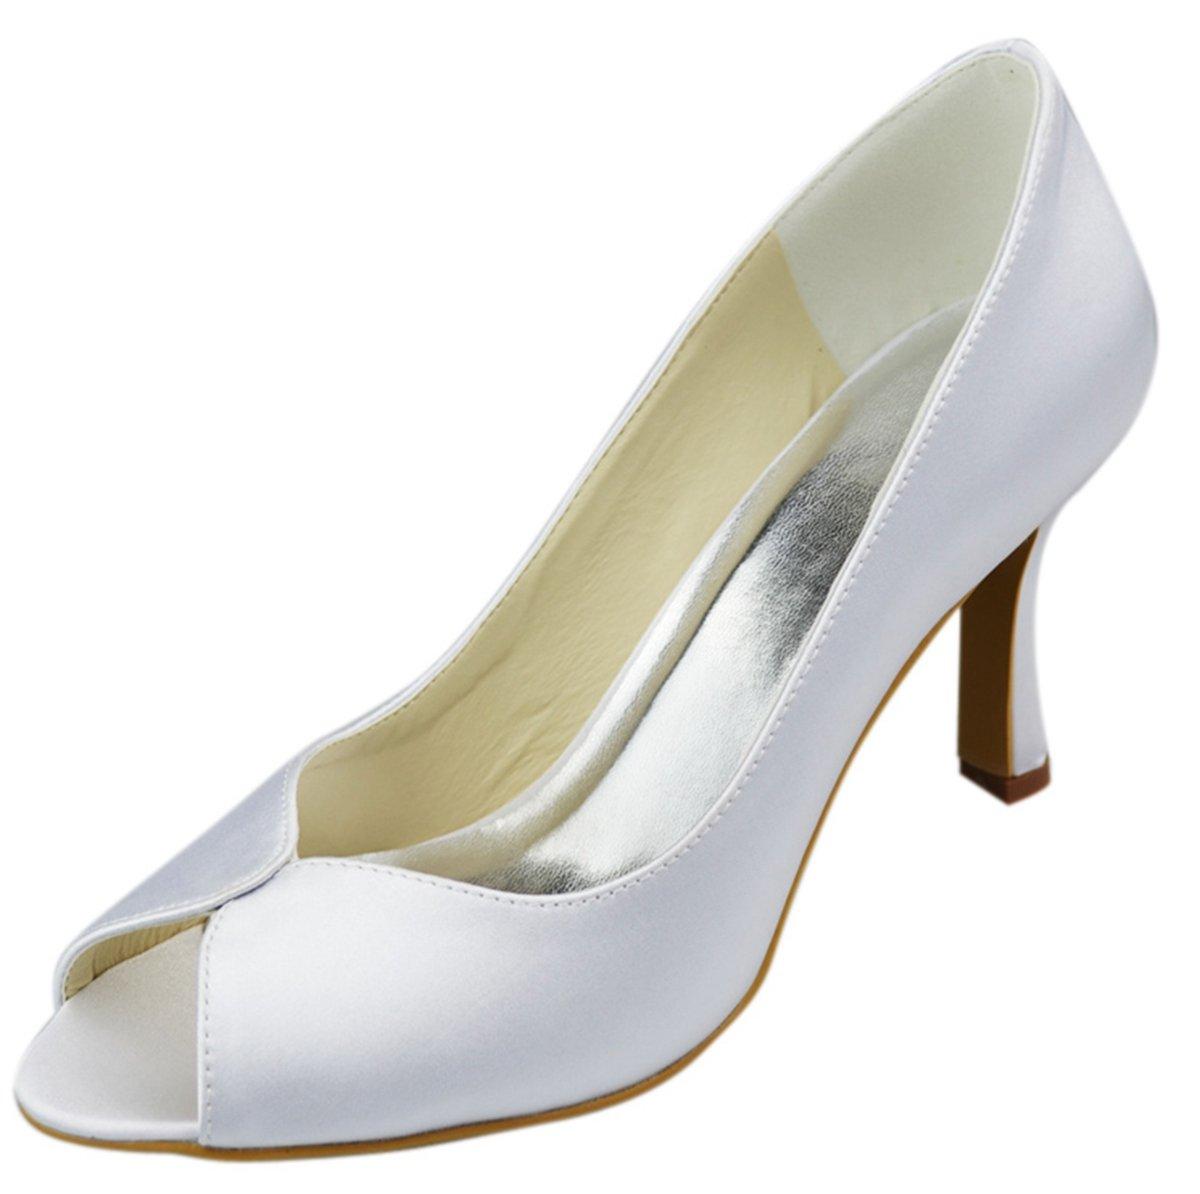 Minitoo Minitoo Blanc , Peep-Toe femme Blanc blanc - blanc 5f88562 - boatplans.space